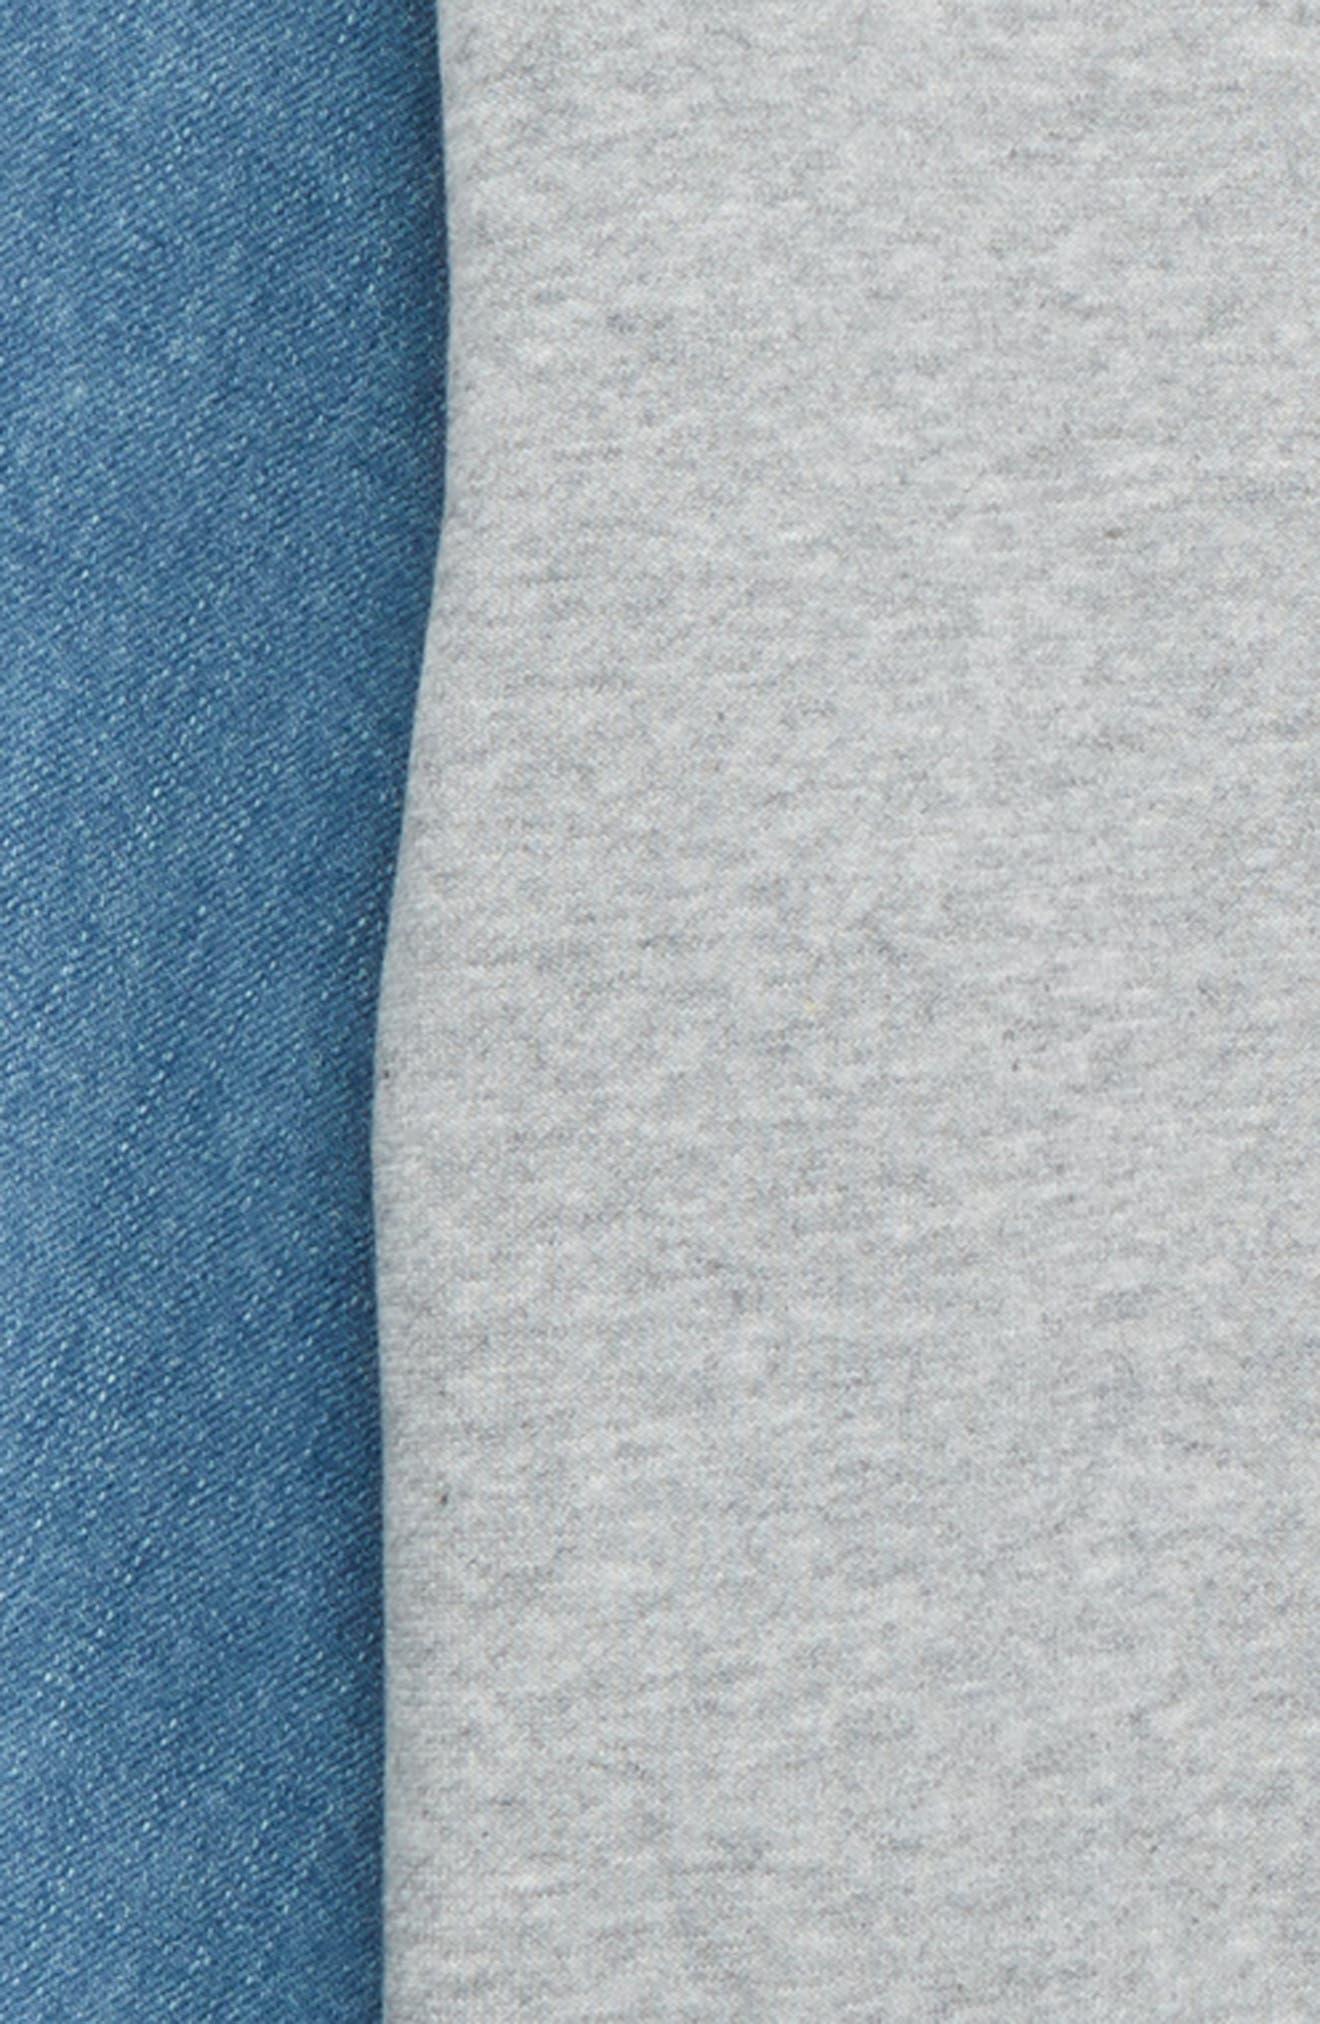 Denim Puff Sleeve Sweatshirt Dress,                             Alternate thumbnail 3, color,                             030